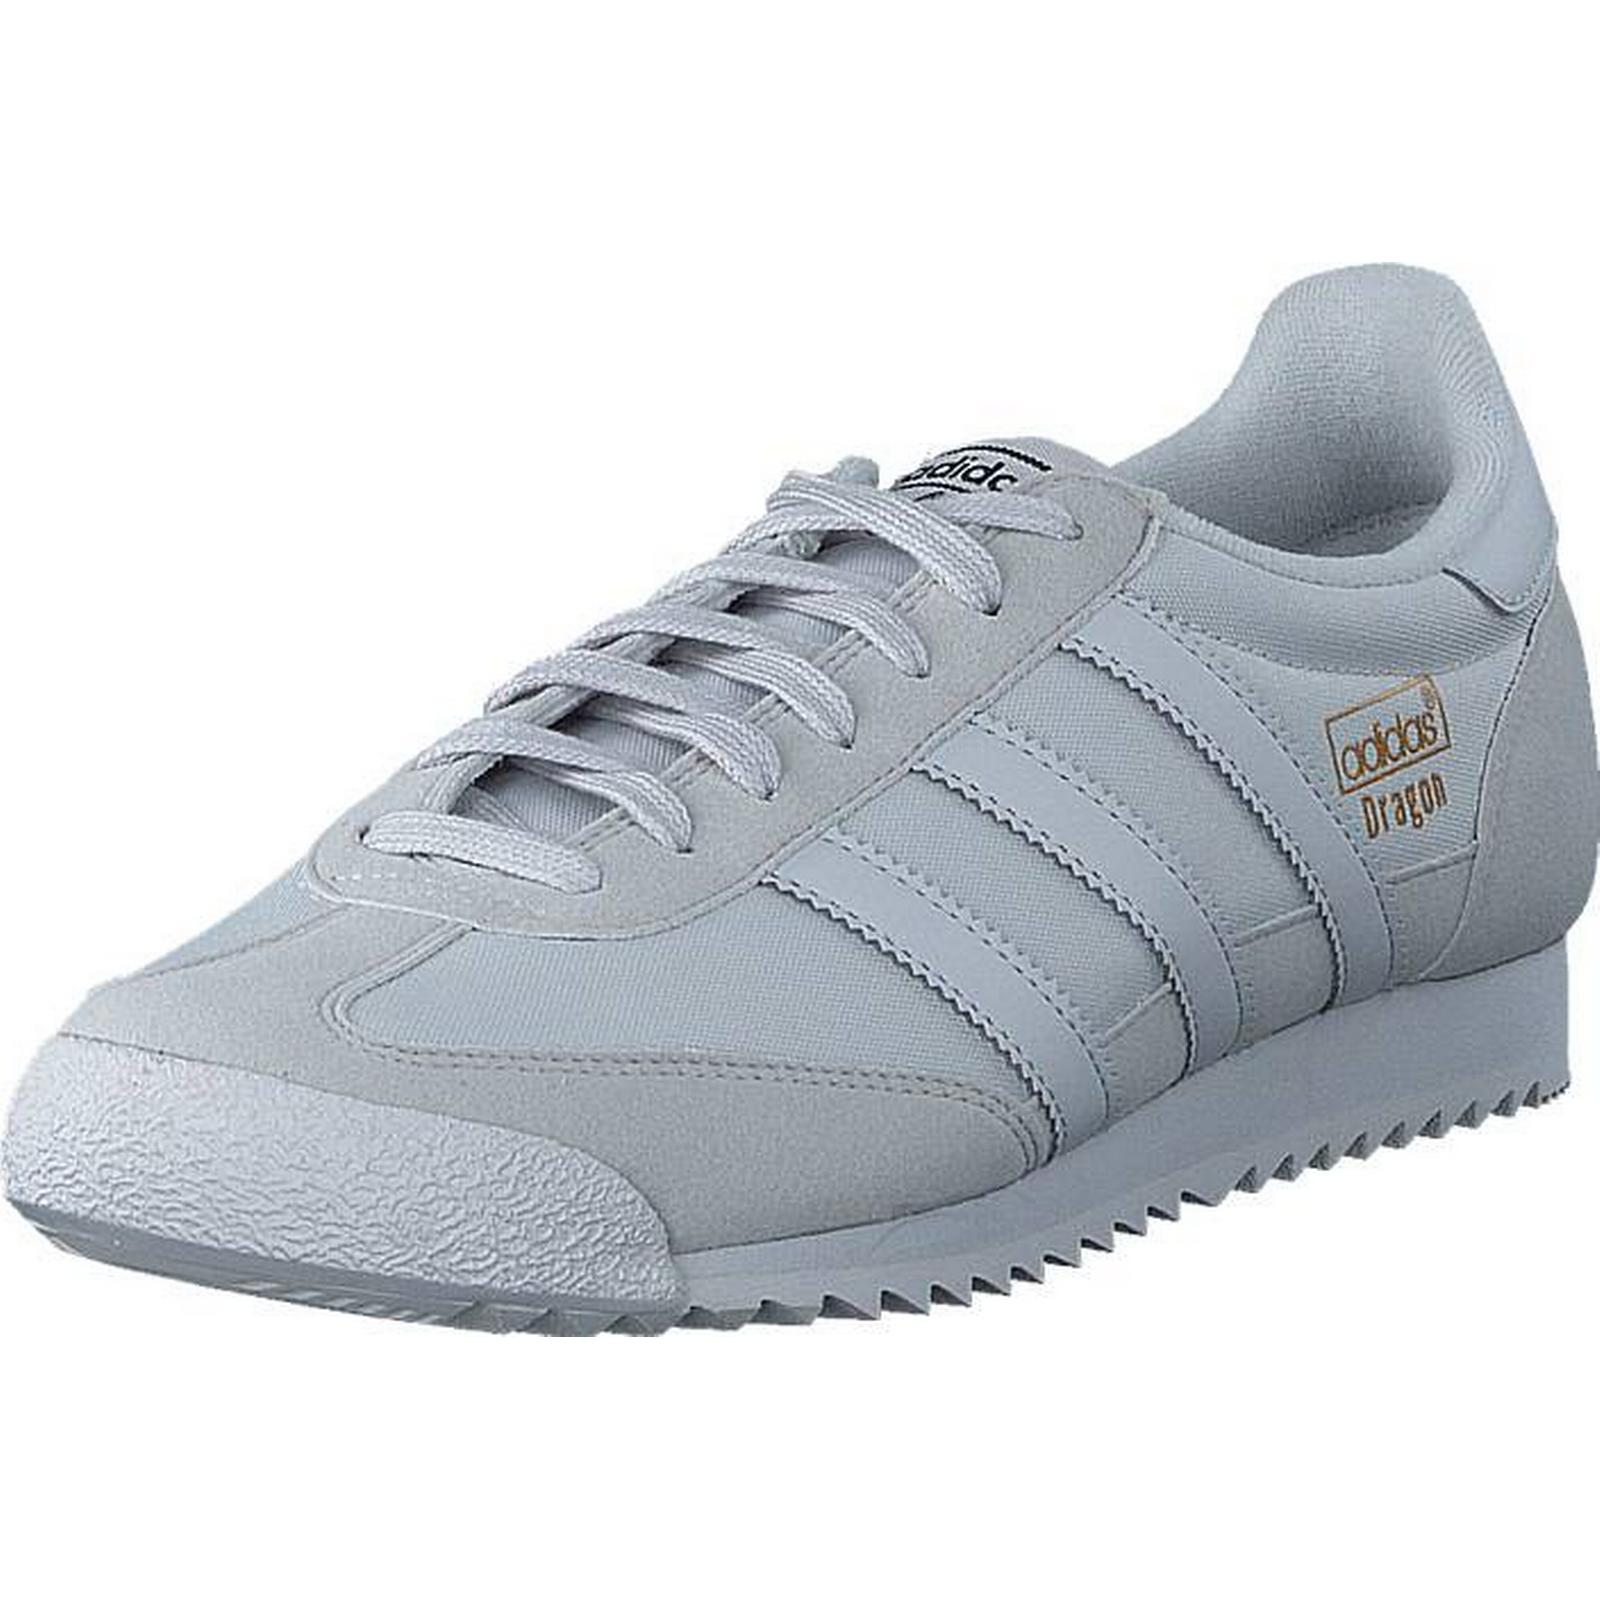 Adidas Originals Originals Adidas Dragon Og Grey One F17/Grey One F17/Grey, Shoes, Trainers & Sport Shoes , Trainers, Grey, Unisex, 36 6d740d